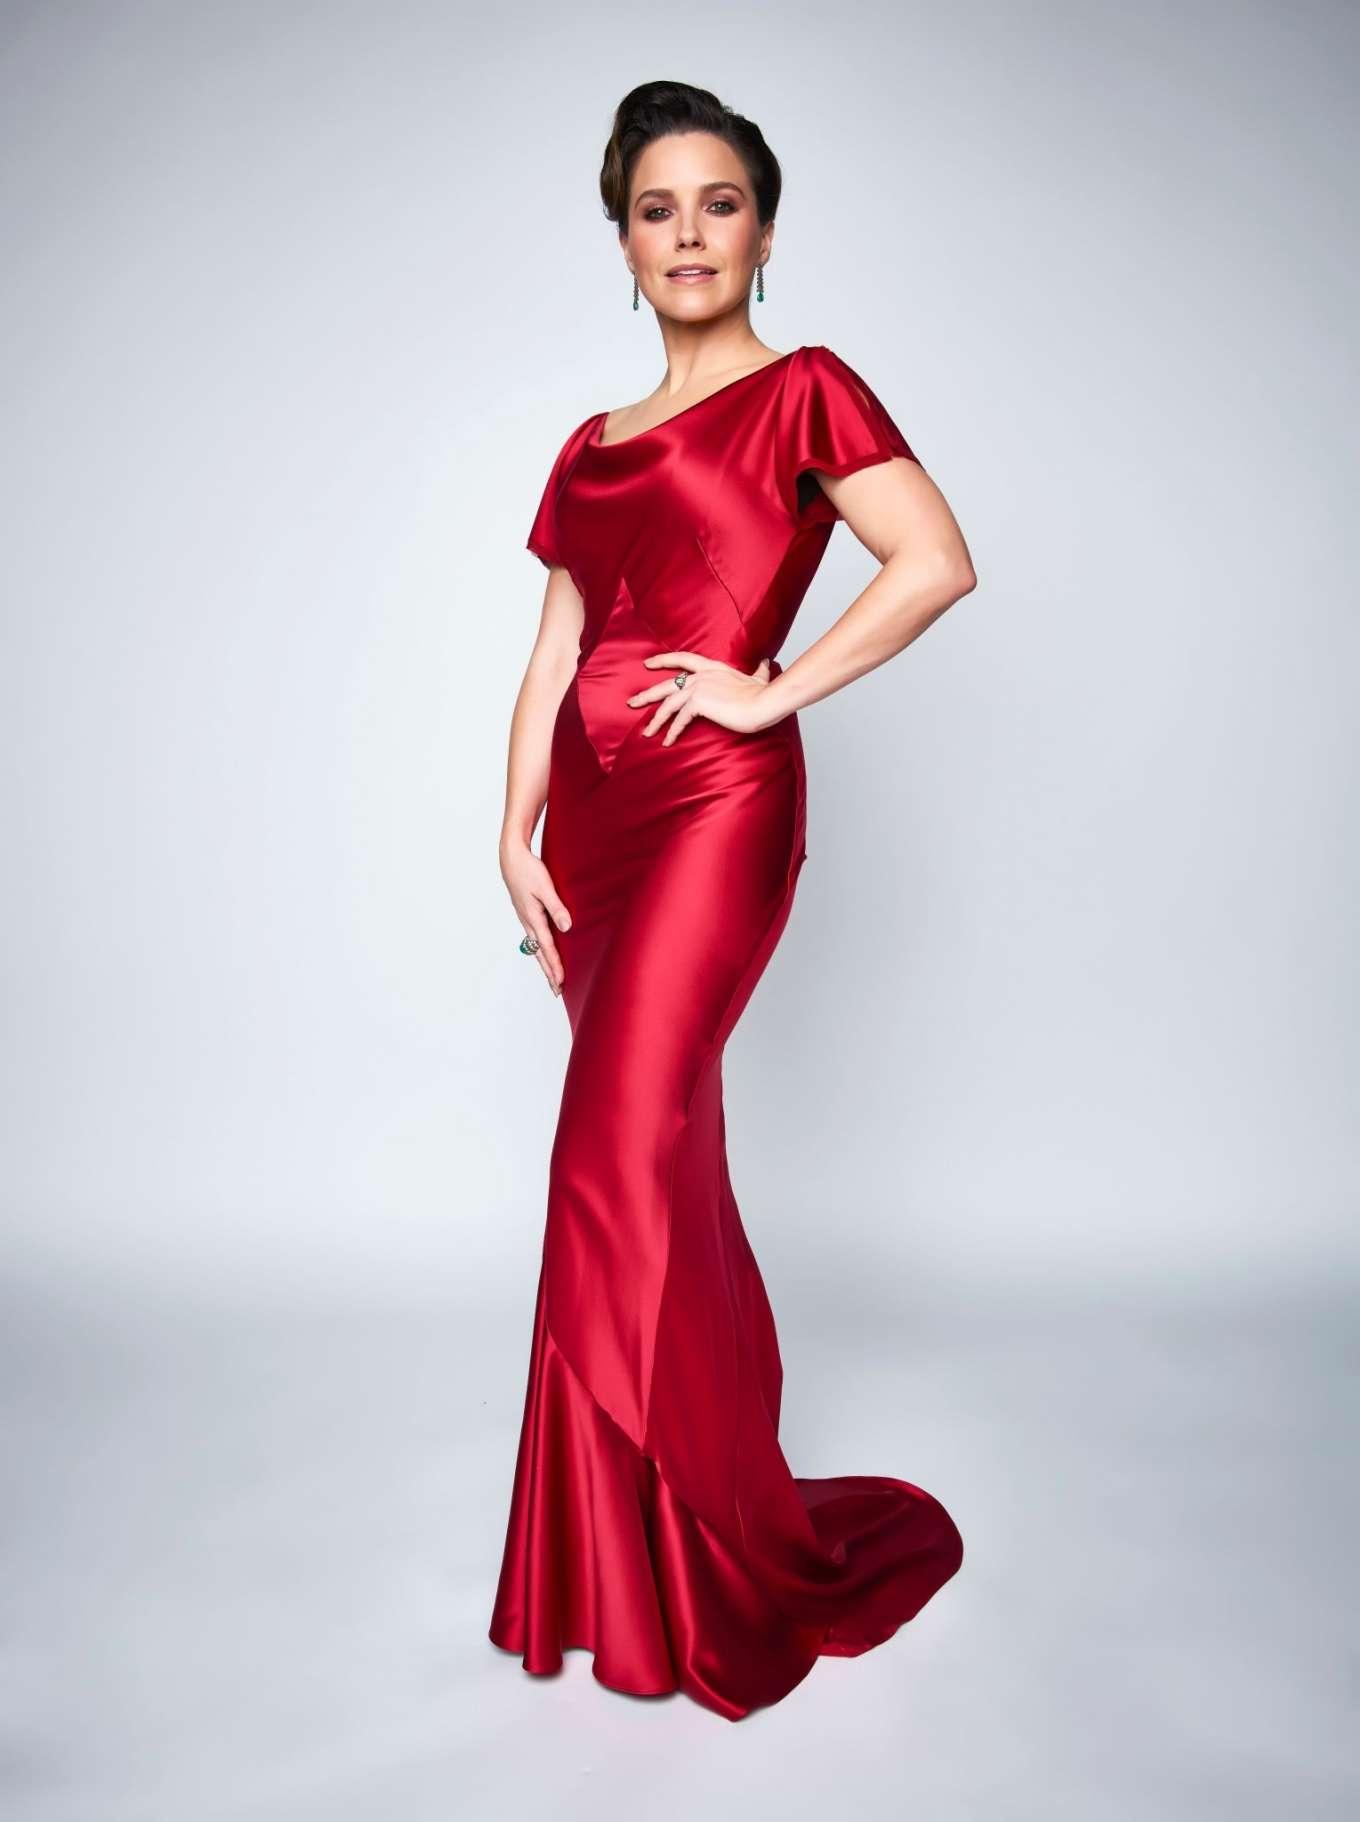 Sophia Bush 2019 : Sophia Bush – National Board of Review Awards Gala portraits 2019-02